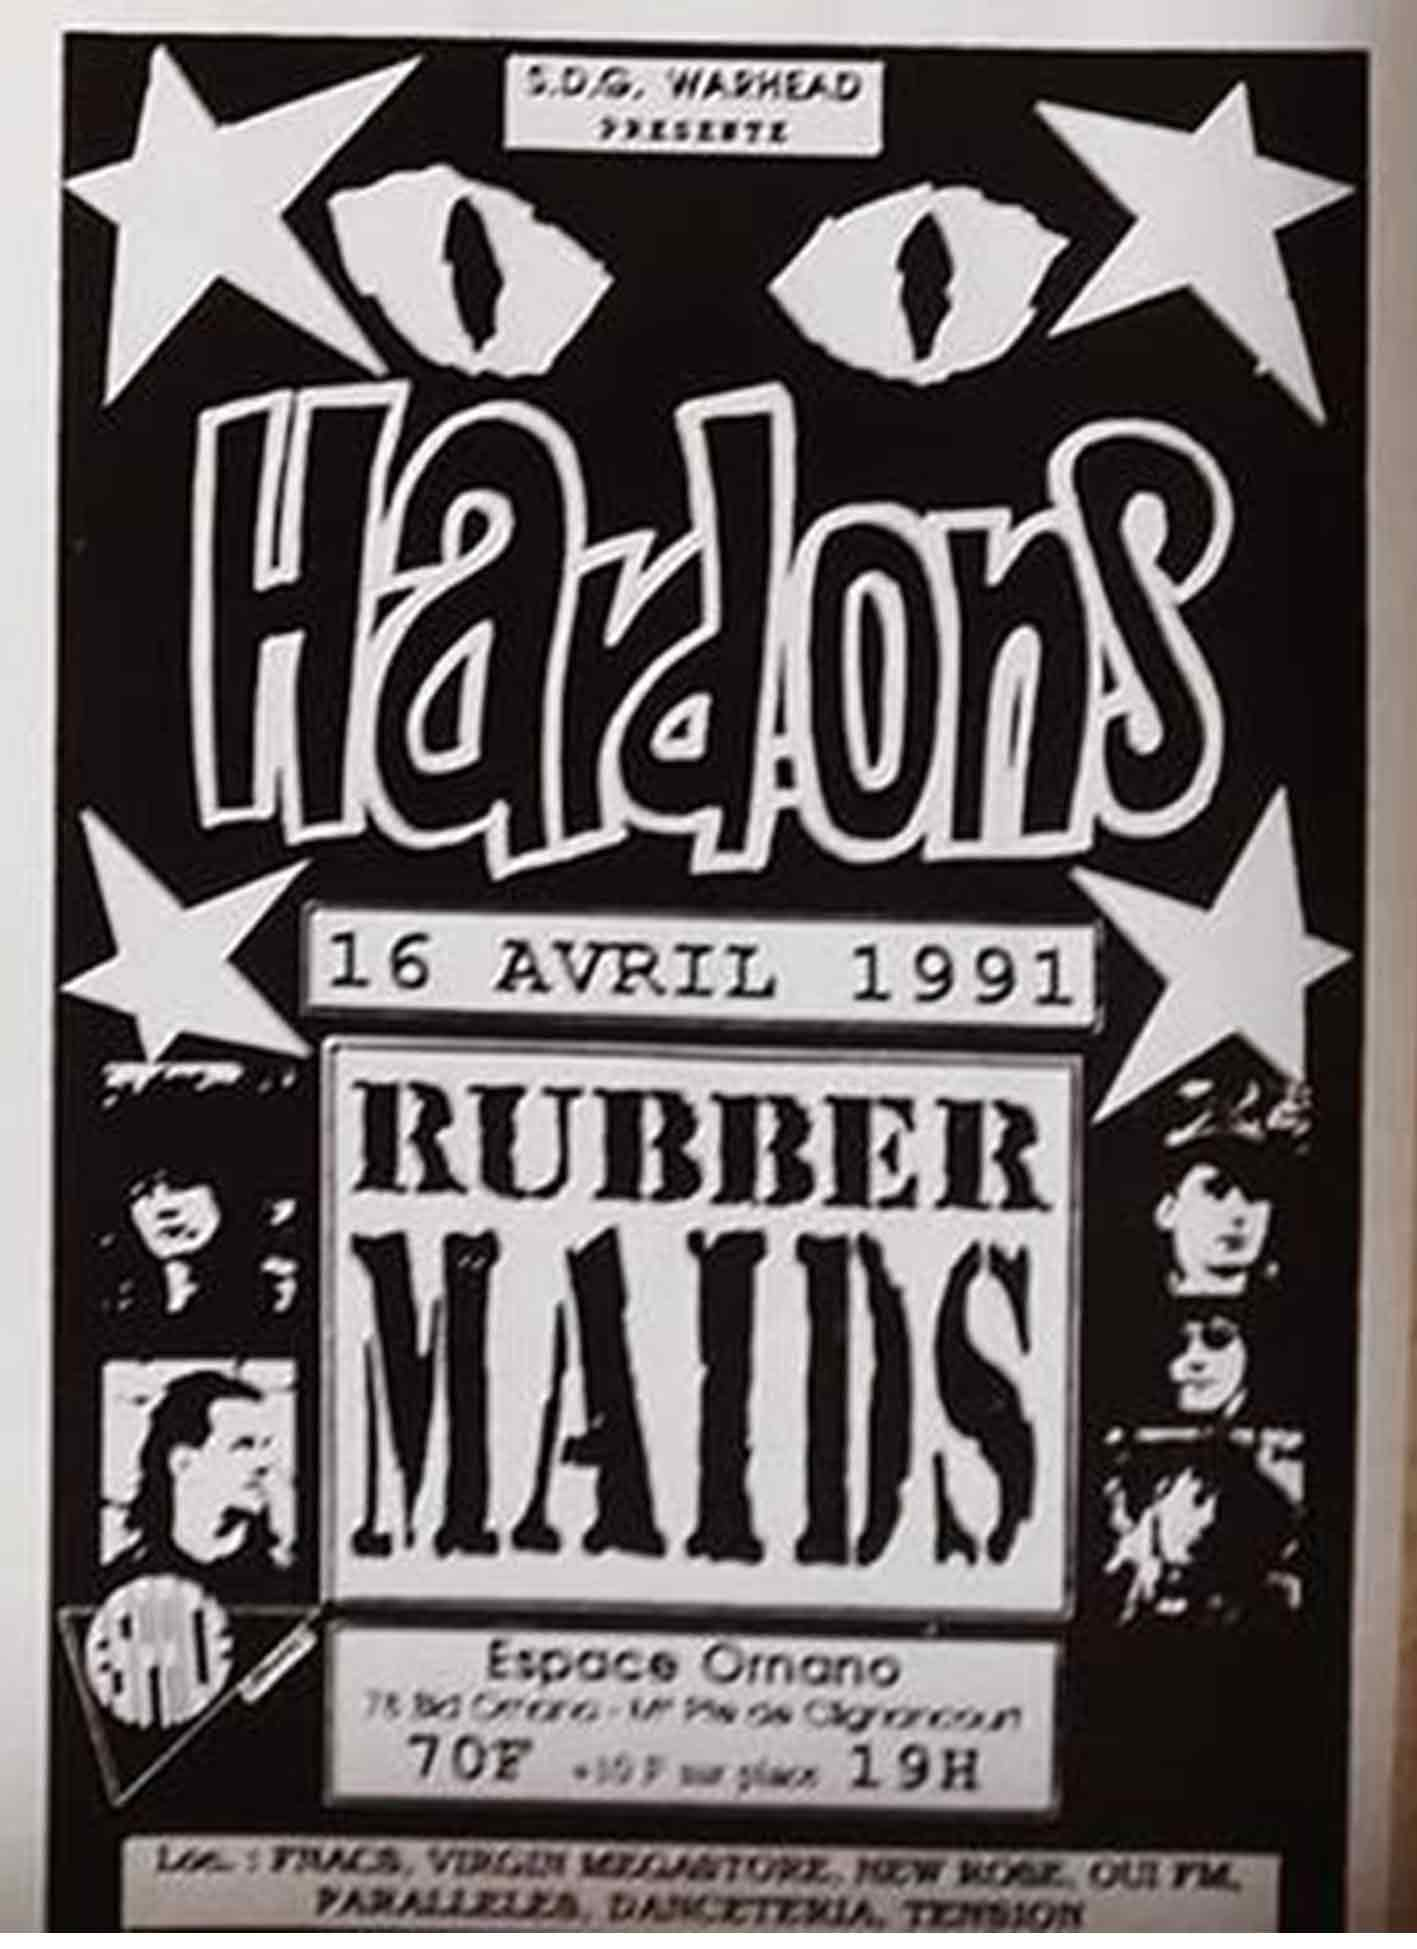 "16 avril 1991 Hard Ons, Rubber Maids à Paris ""Espace Ornano"""